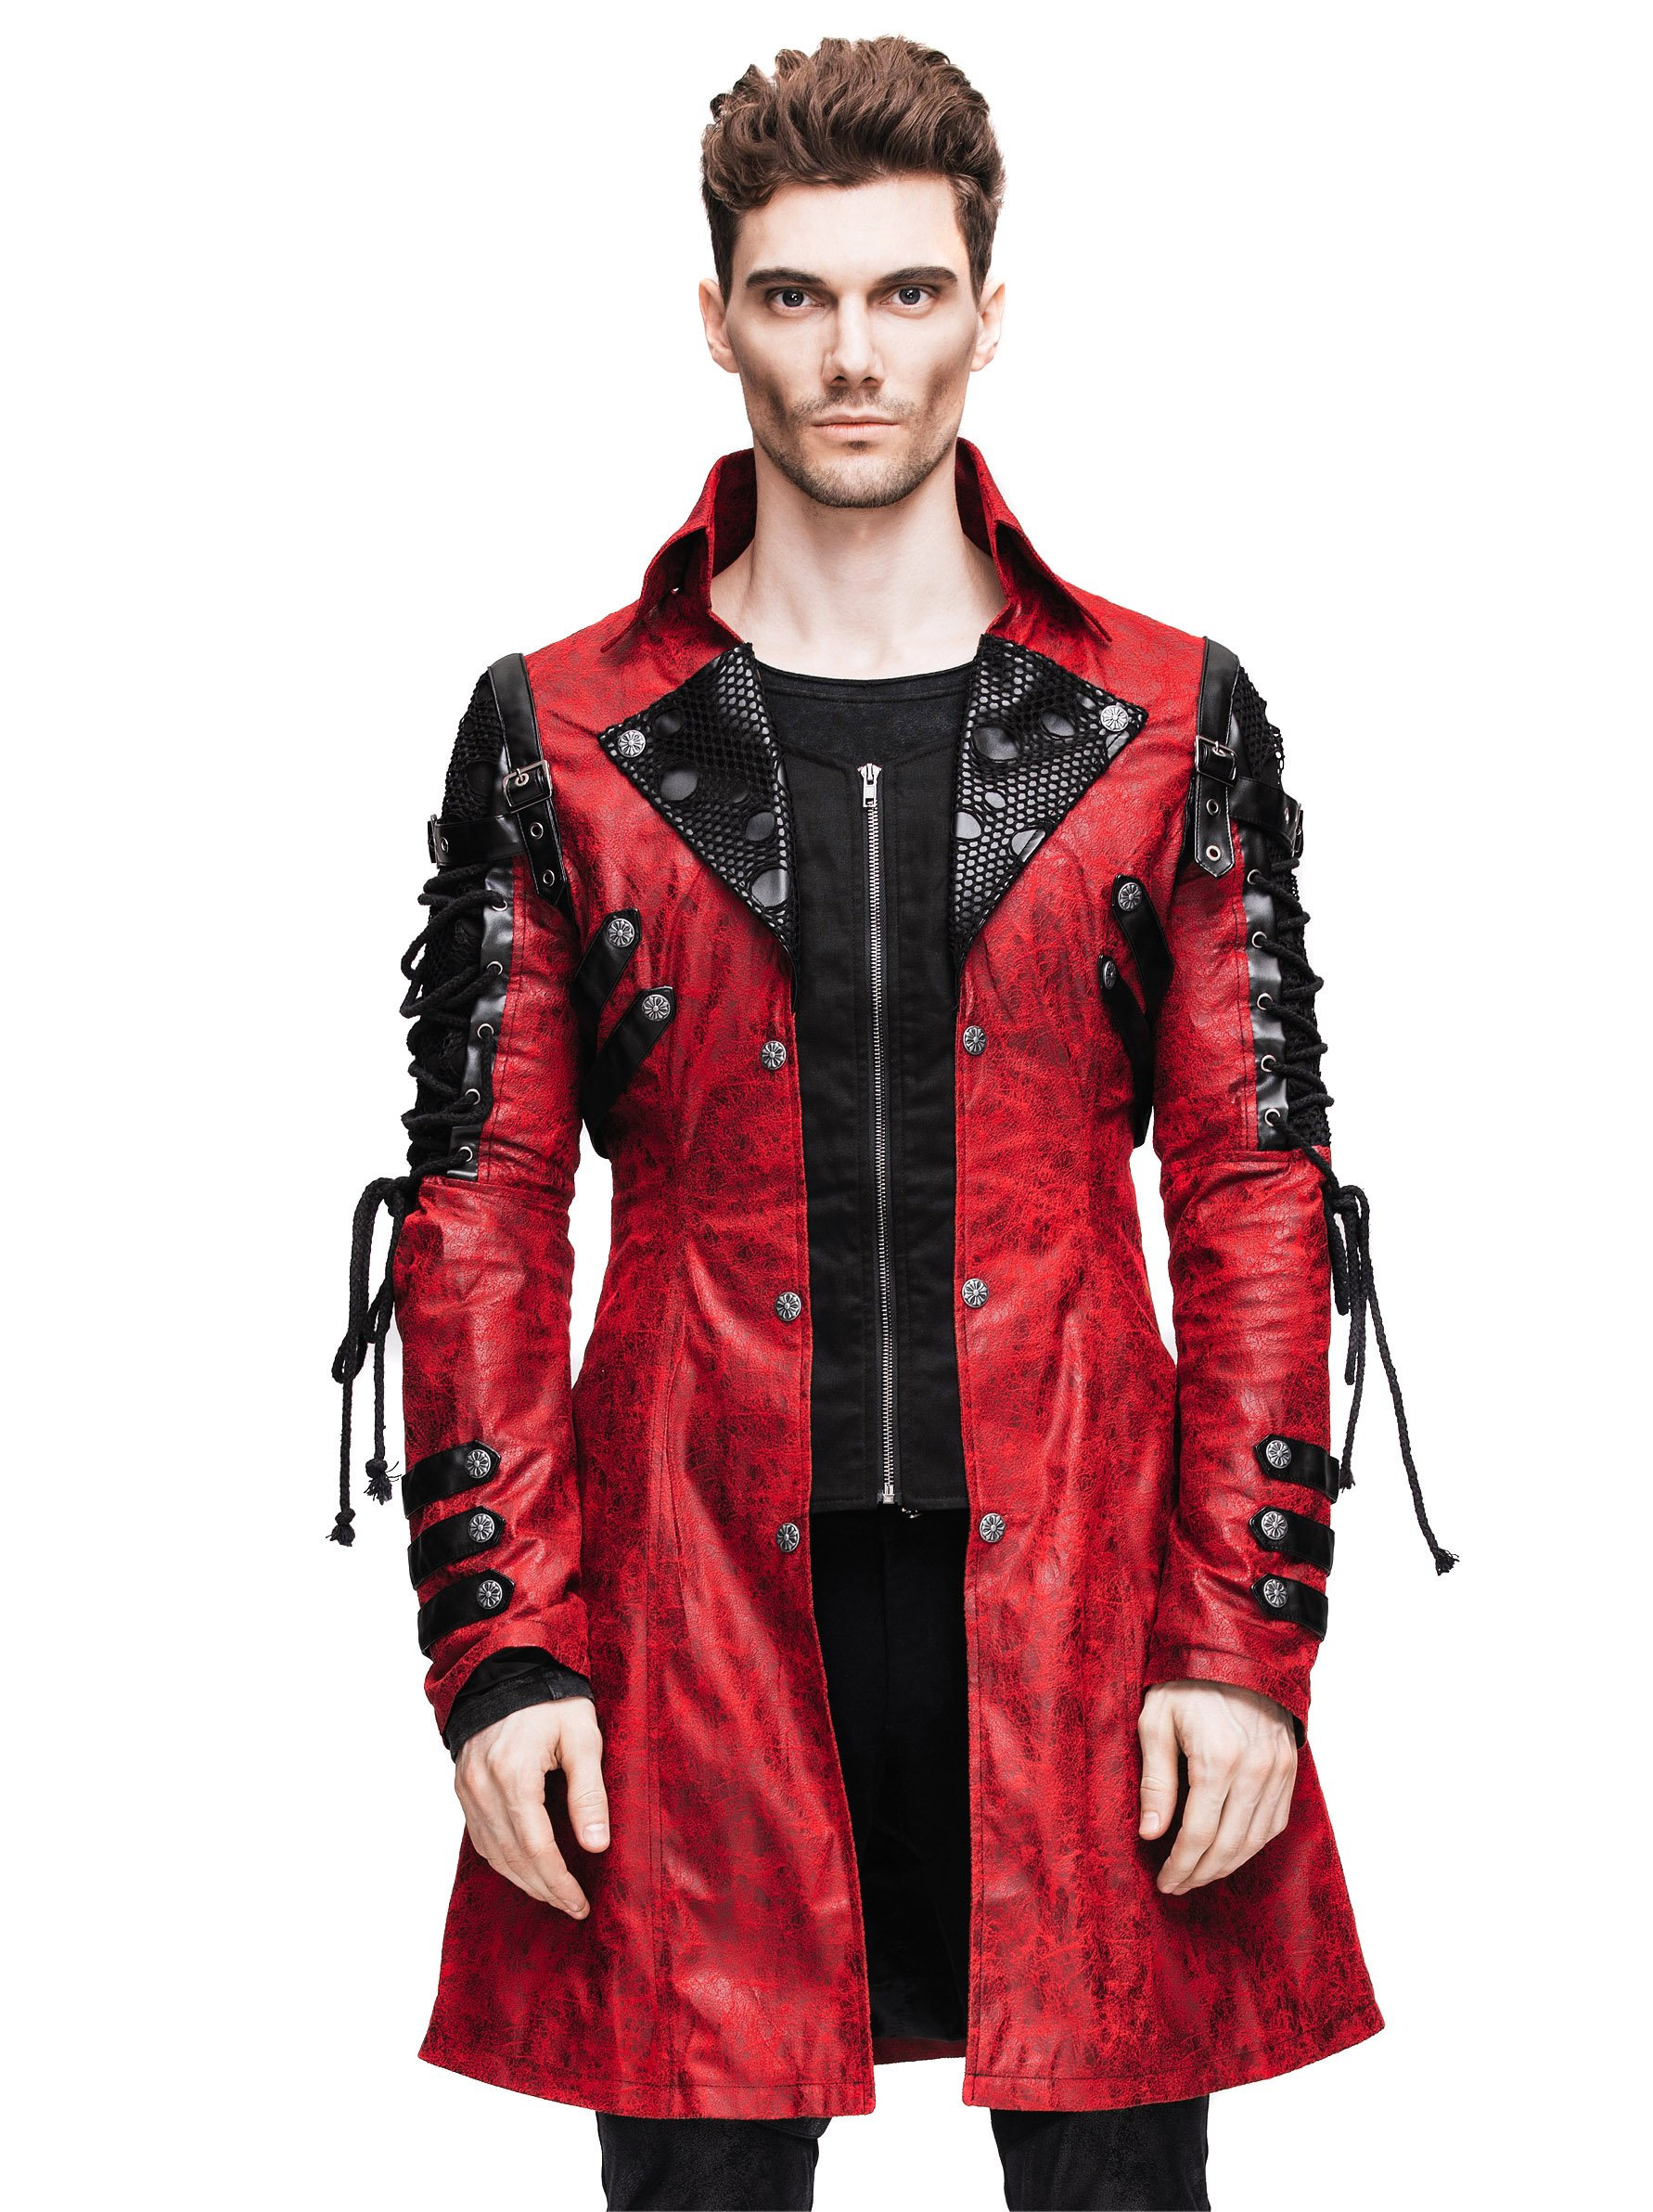 Steampunk Coat Gothic Clothing Cyberpunk Punk Jacket Coat Renaissance Costume (L)